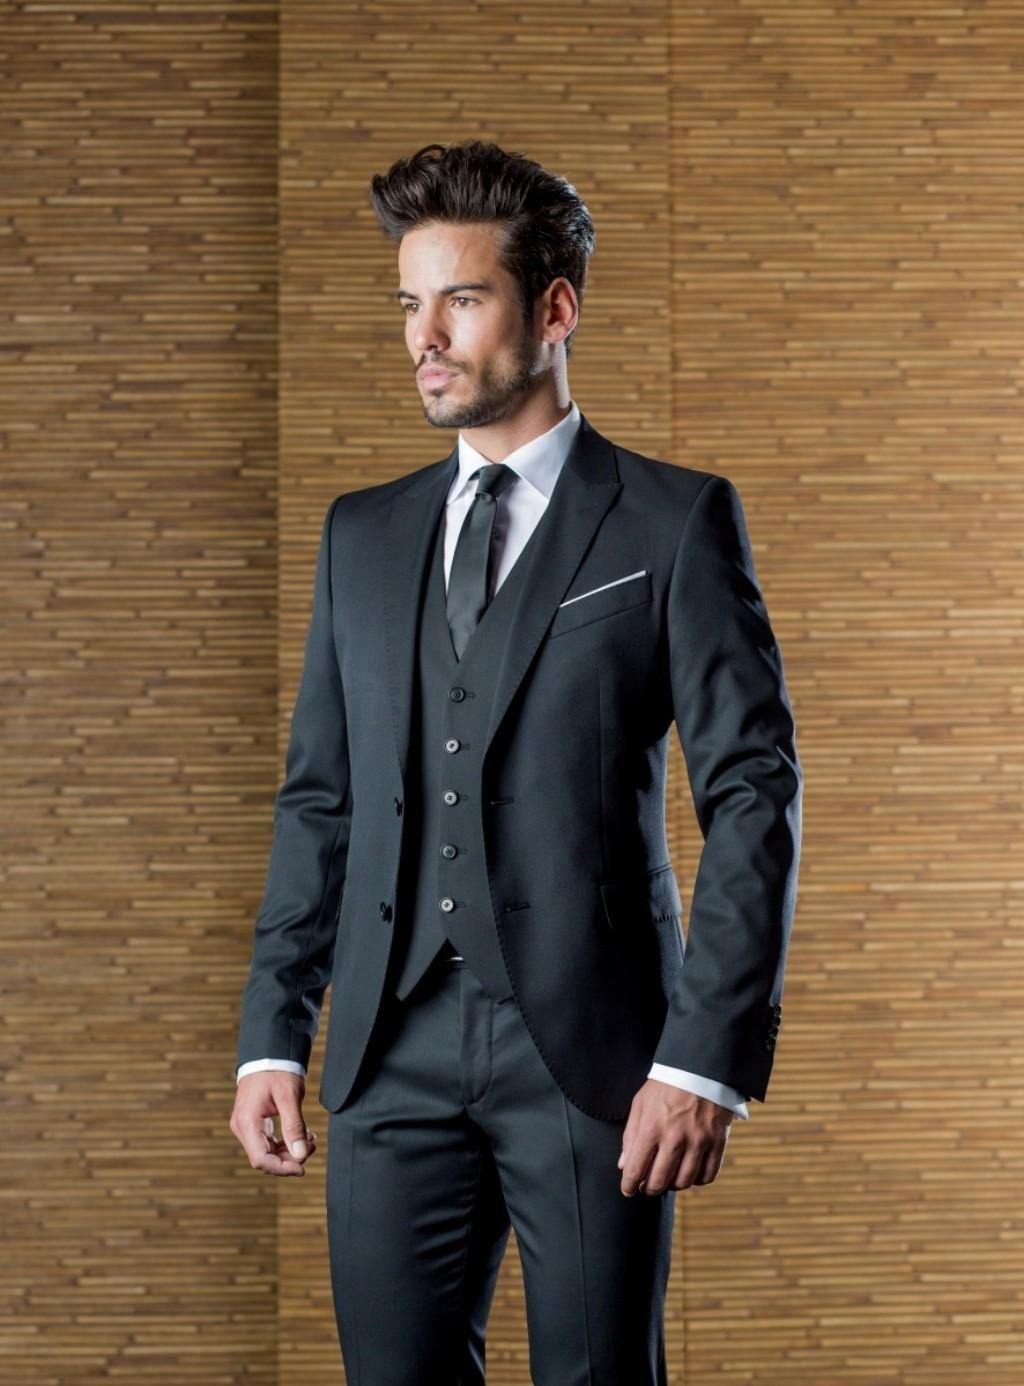 Handsome Black Wedding Mens Suits Slim Fit Bridegroom Tuxedos For ...